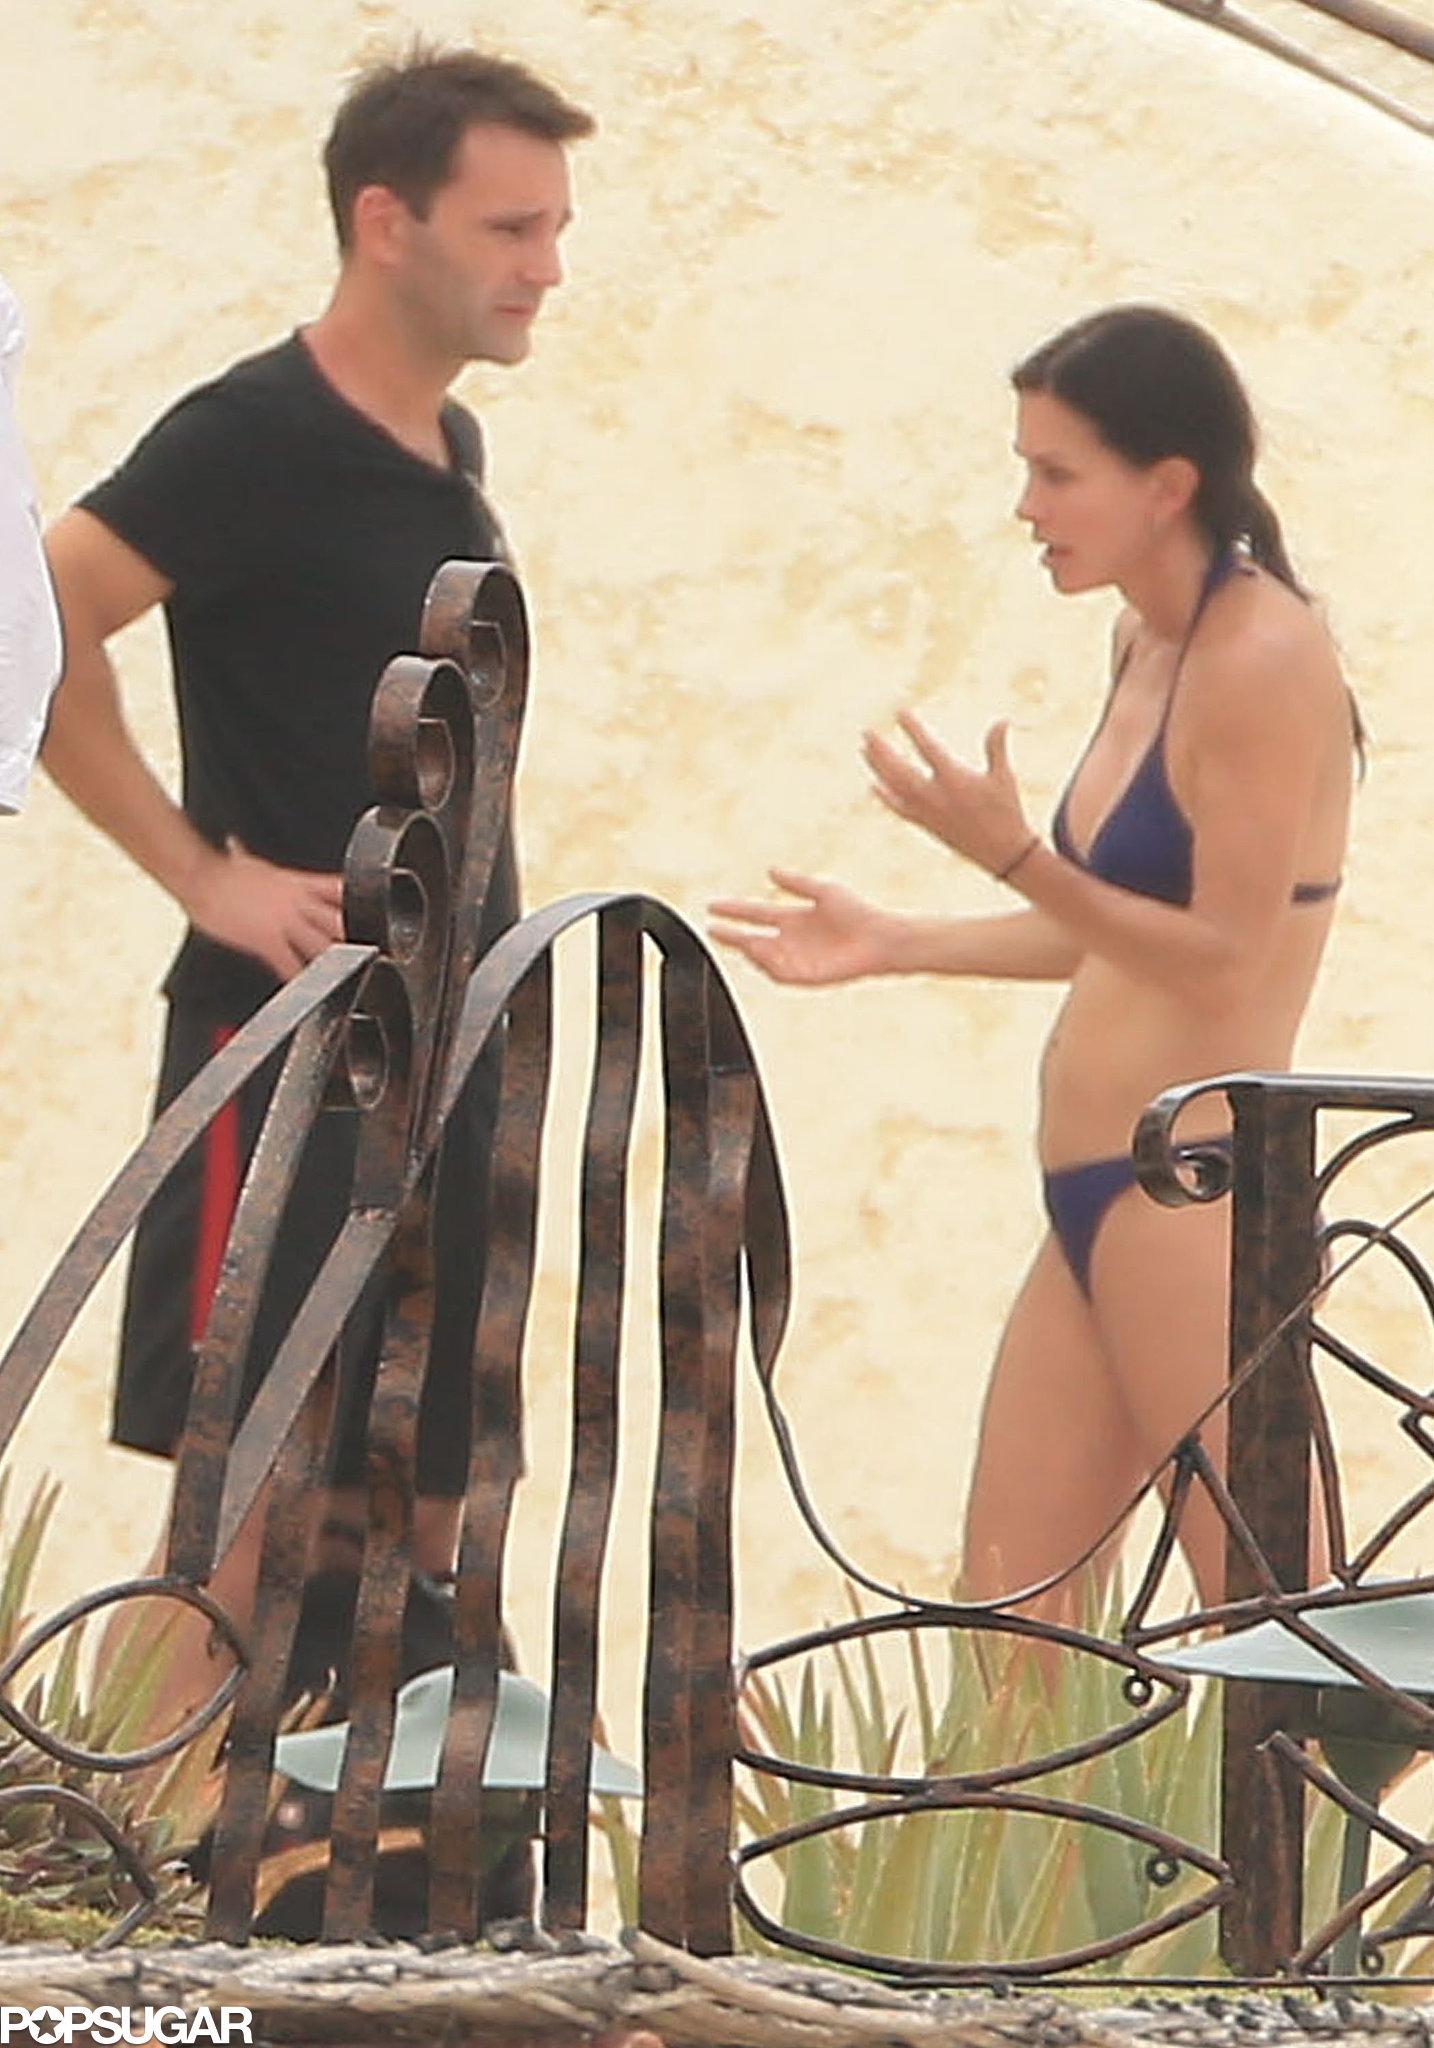 Courteney Cox Is Back in a Bikini and Still Looking Superhot